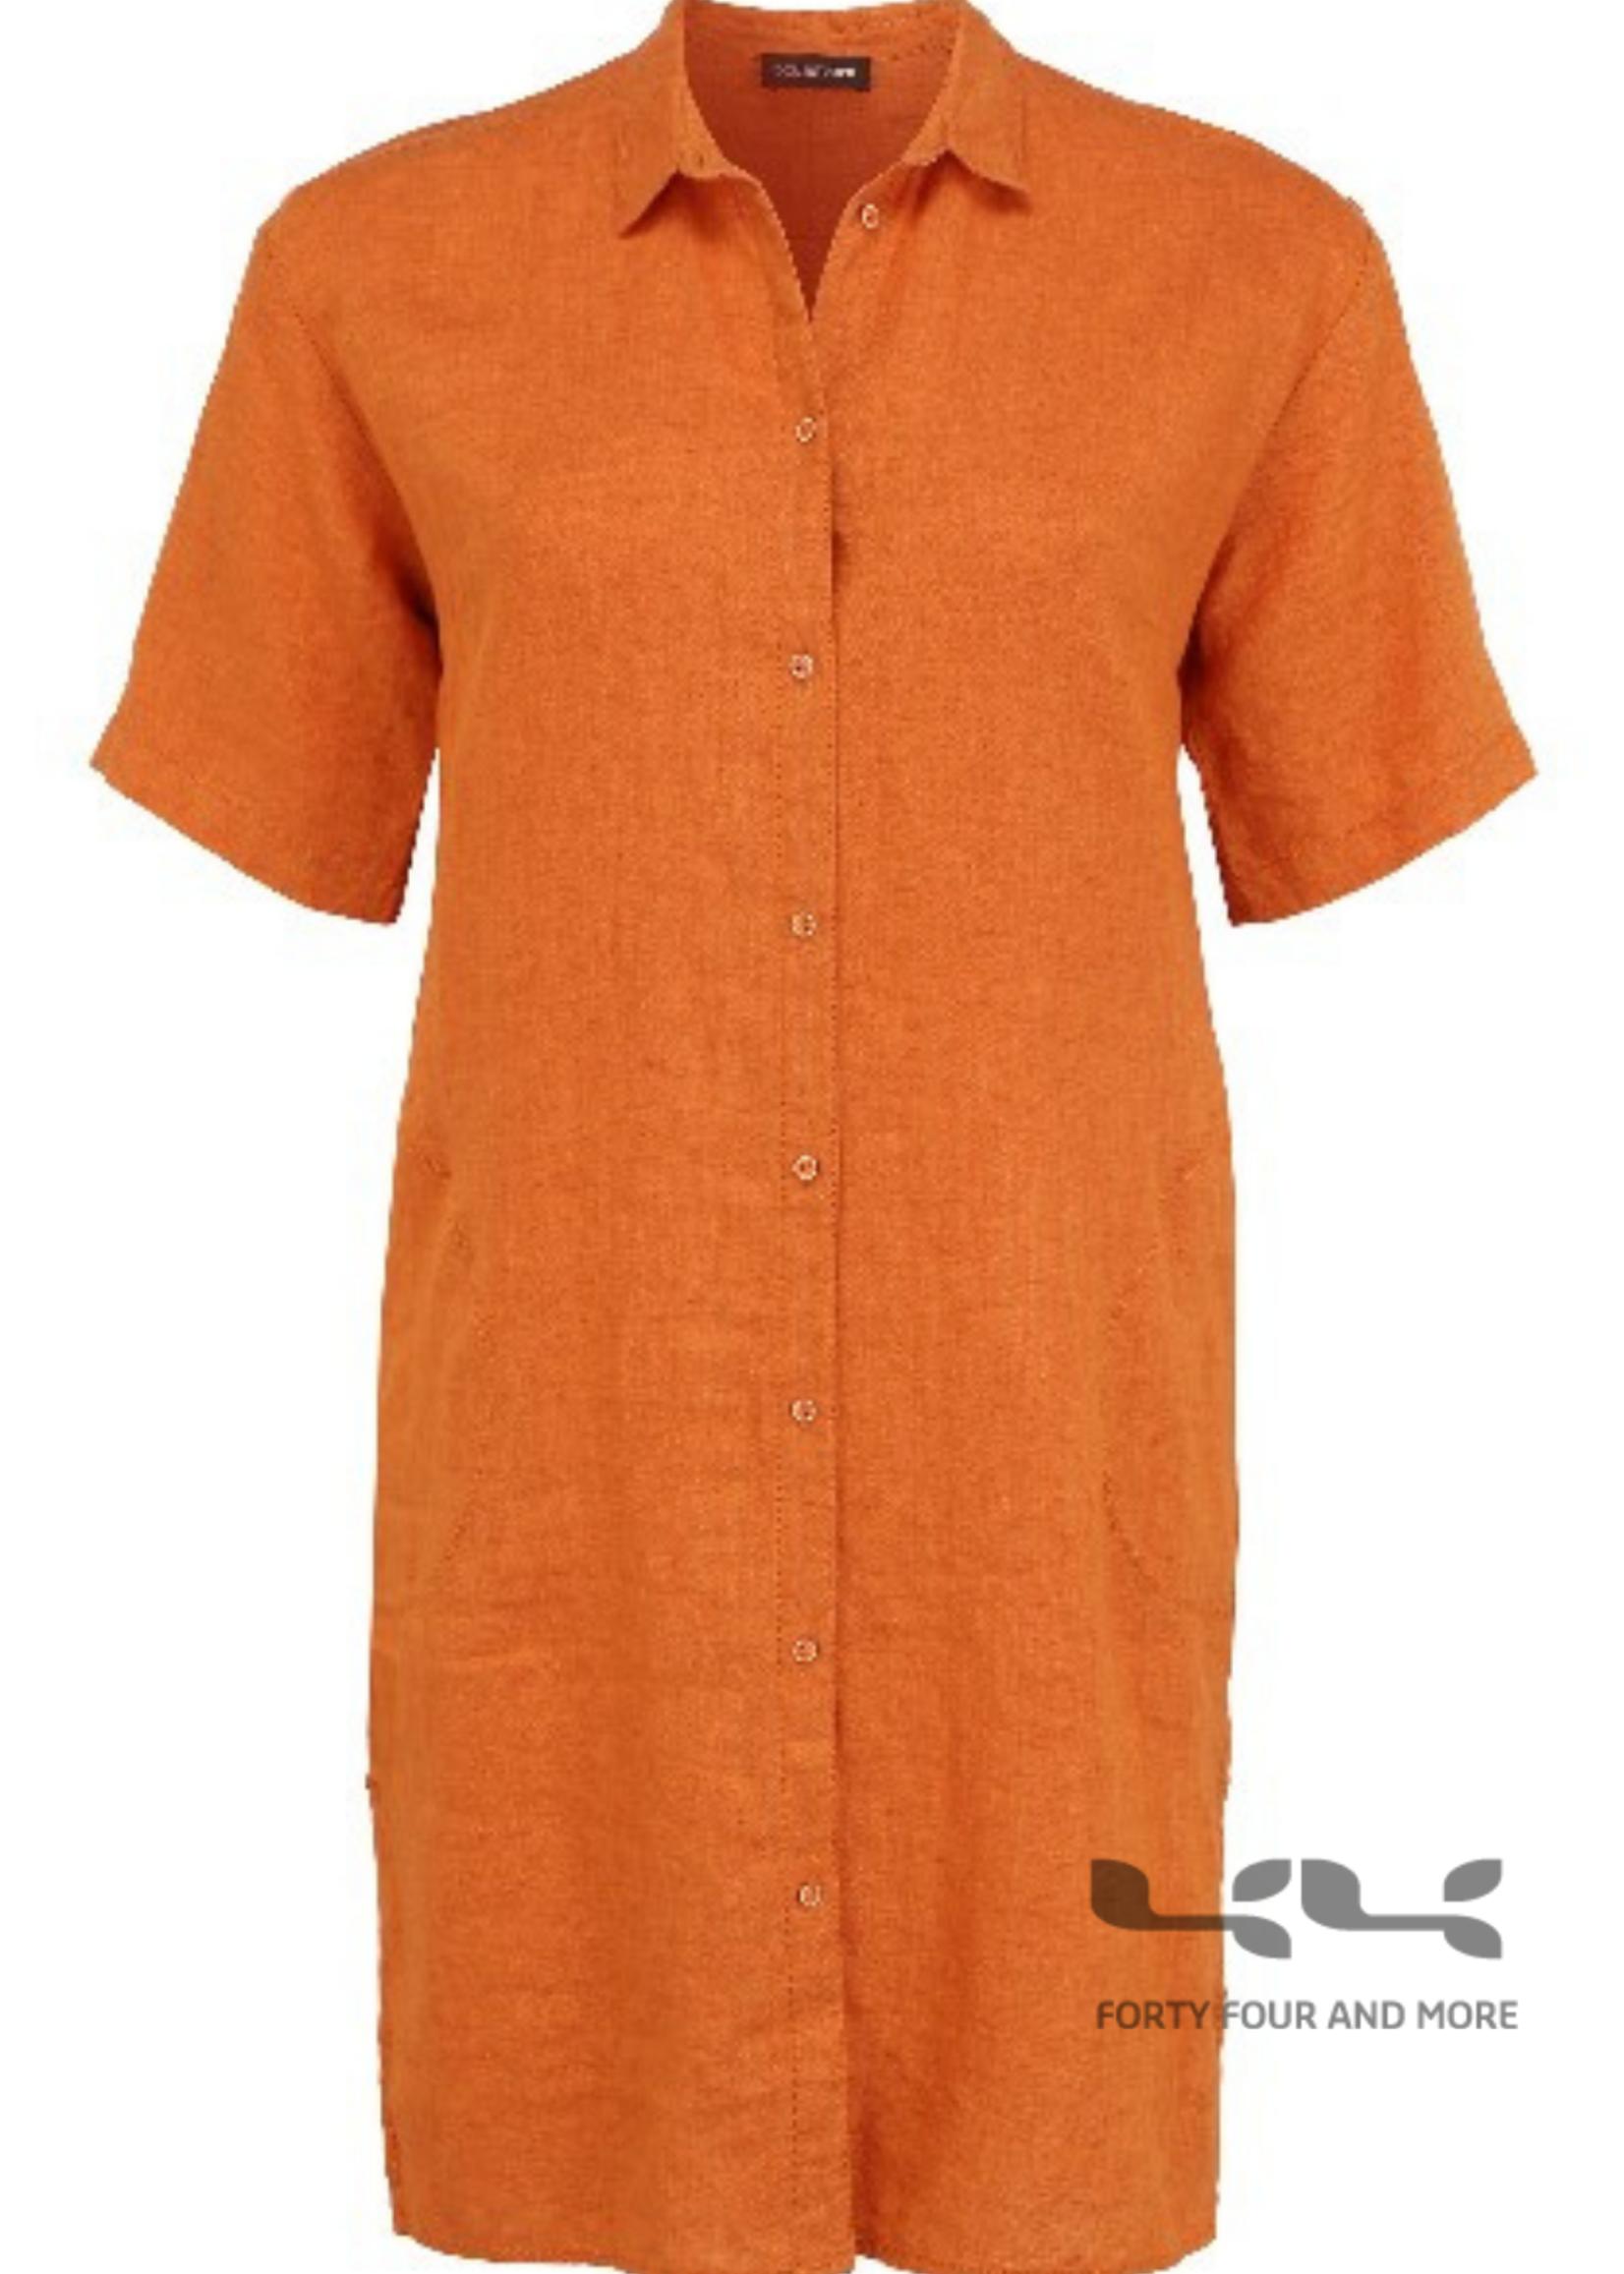 Doris Streich Doorknoopjurk / blouse linnen